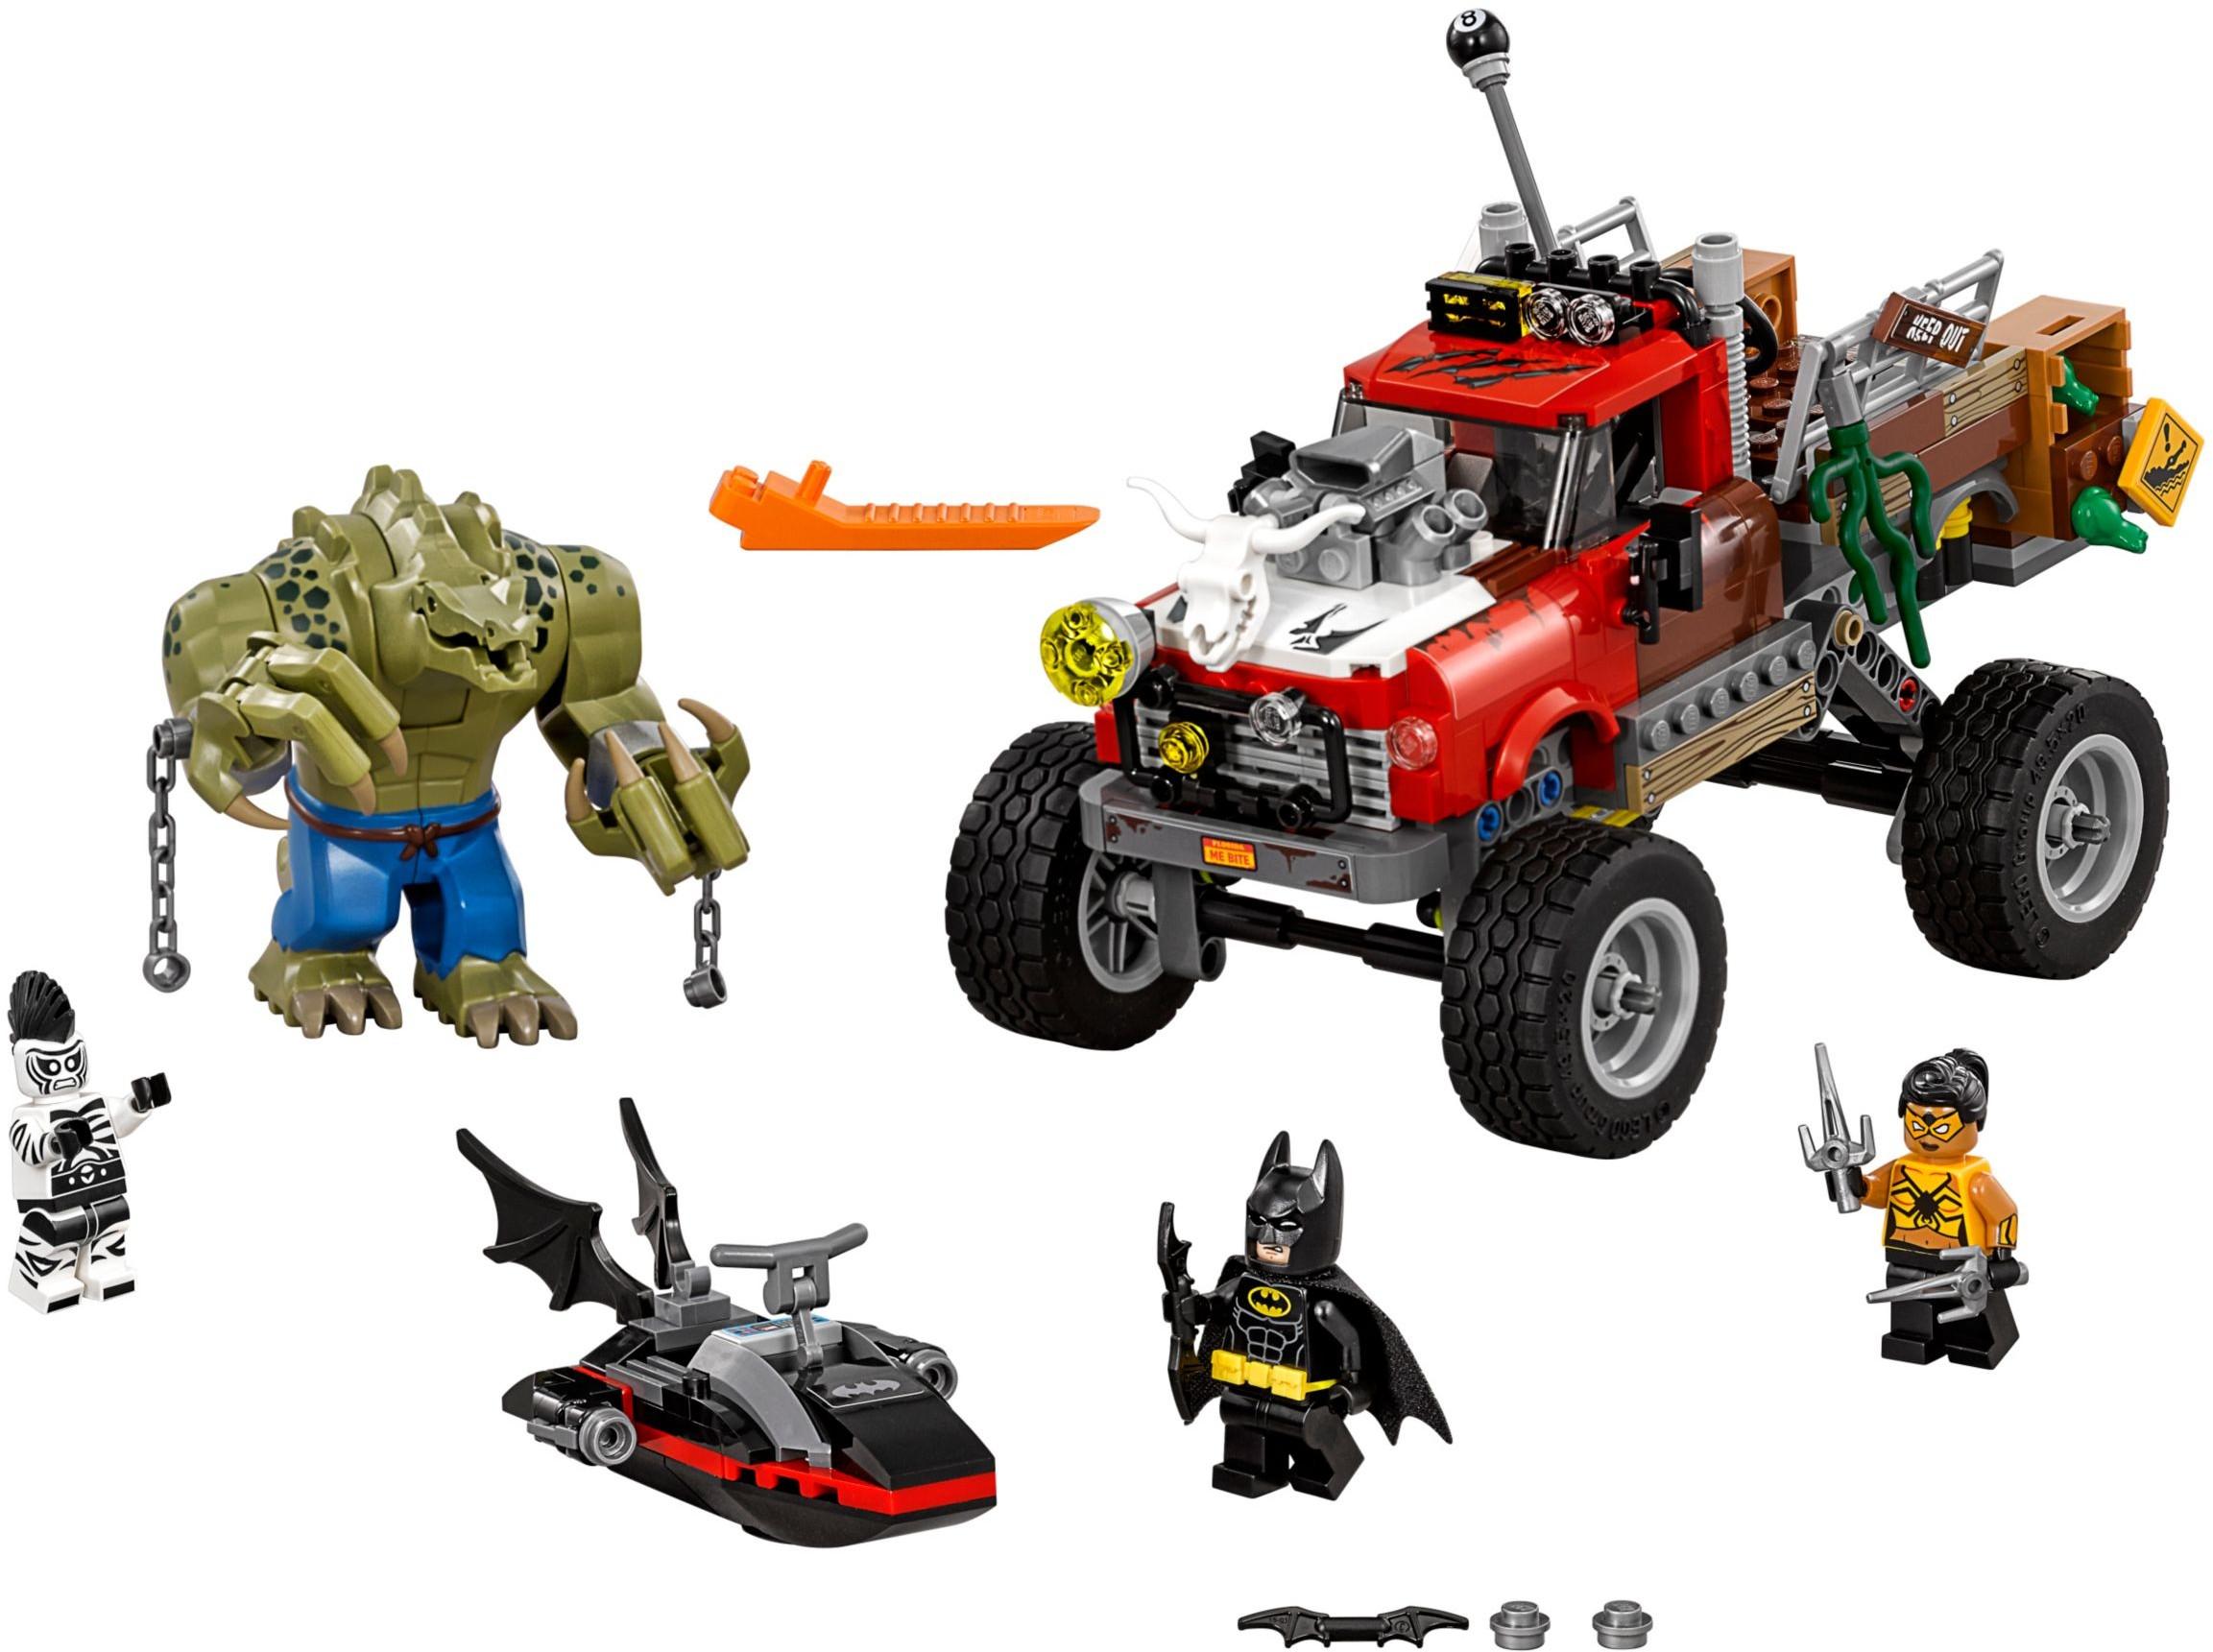 NEU 2017 EXCLUSIVE THE LEGO® BATMAN MOVIE Joker aus 70912 Arkham Asylum